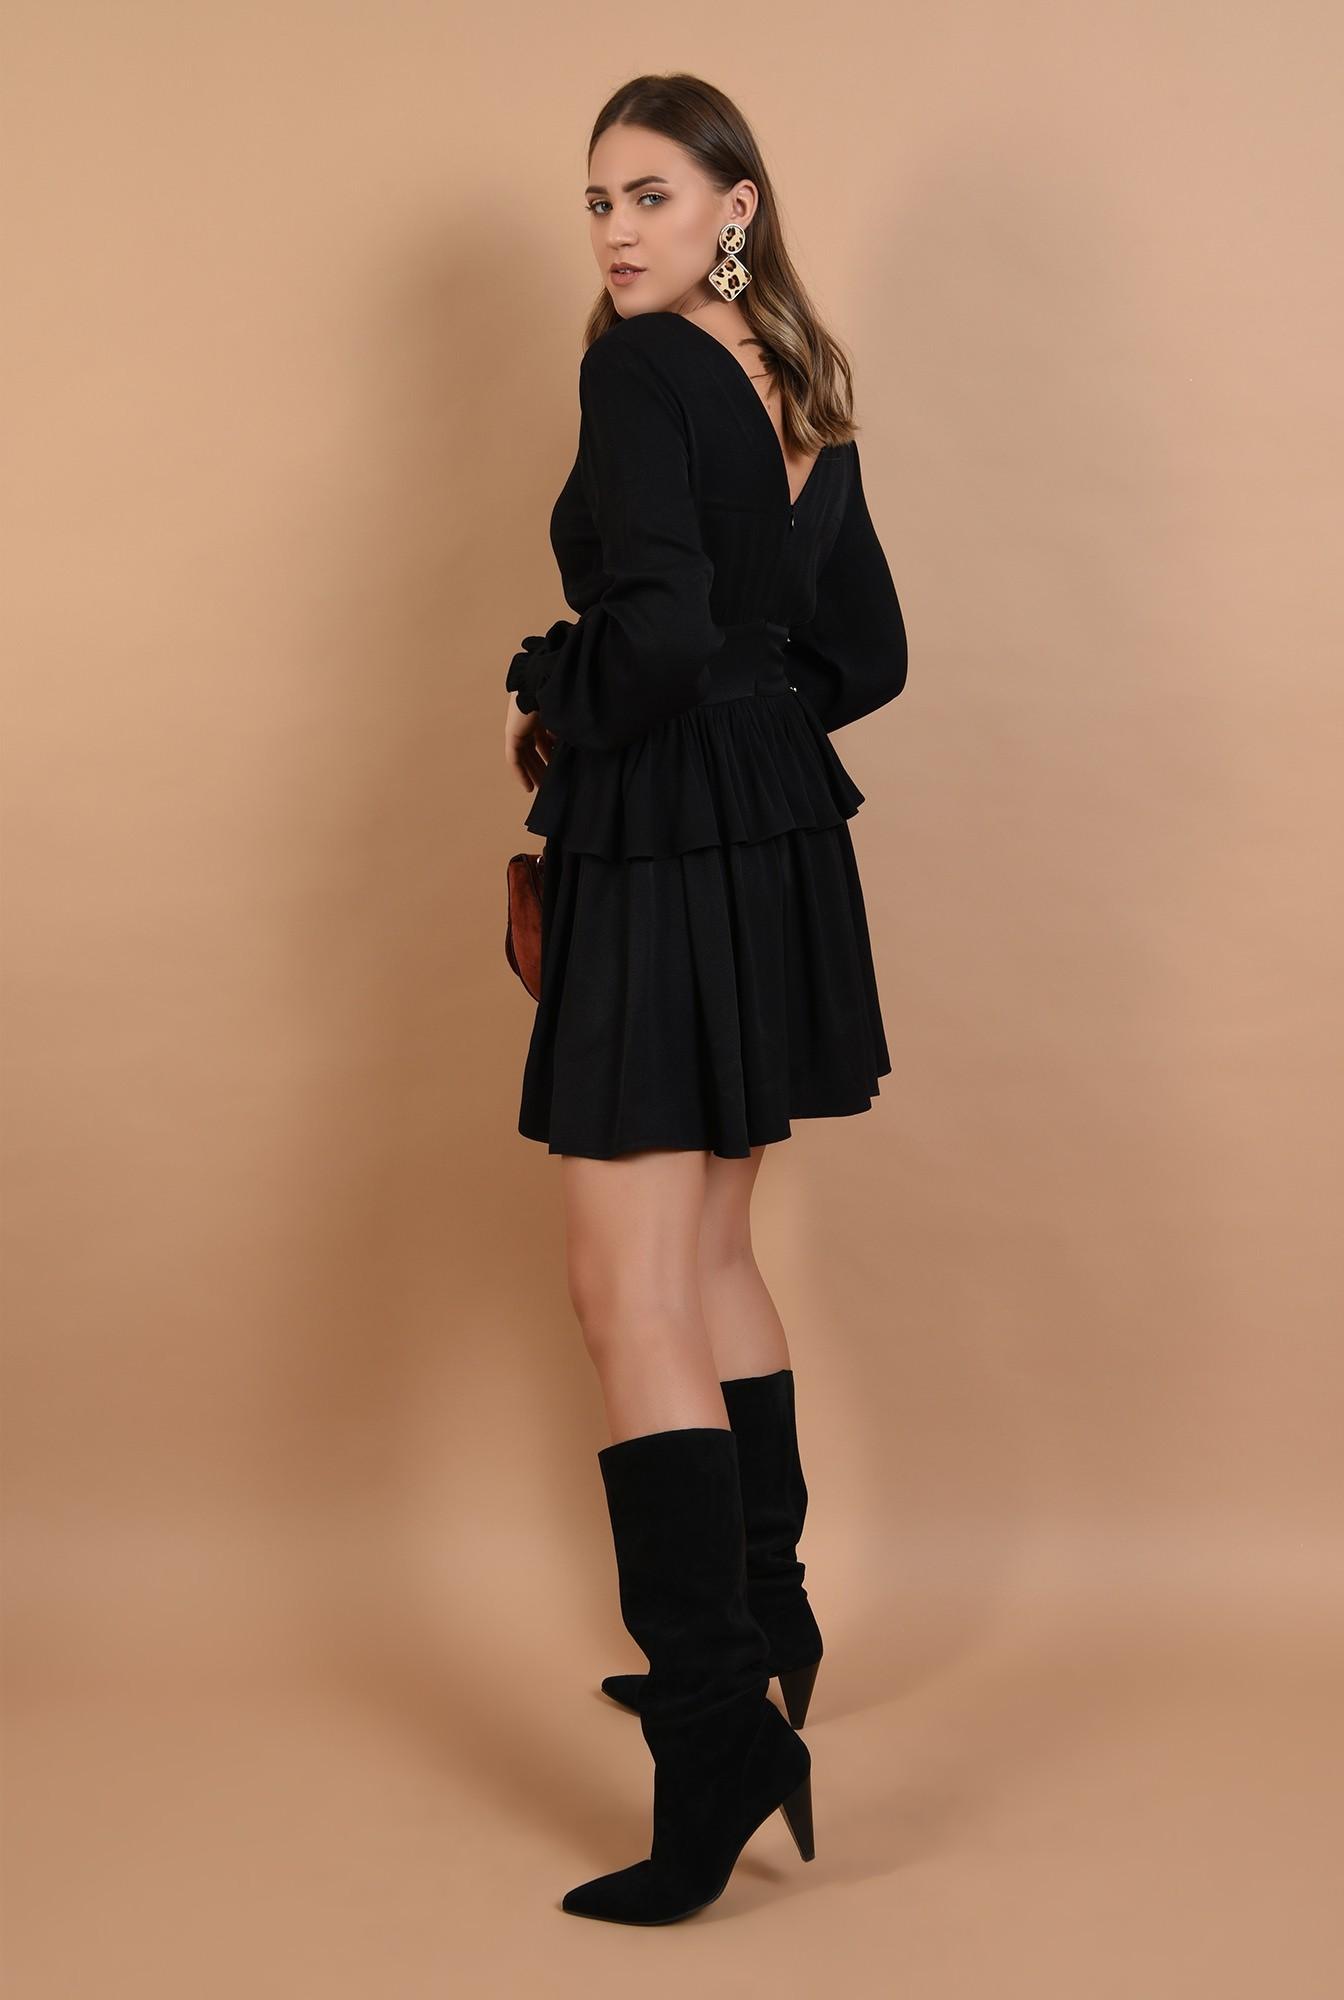 1 - rochie mini, neagra, volan, peplum, nasturi aurii, anchior, Poema